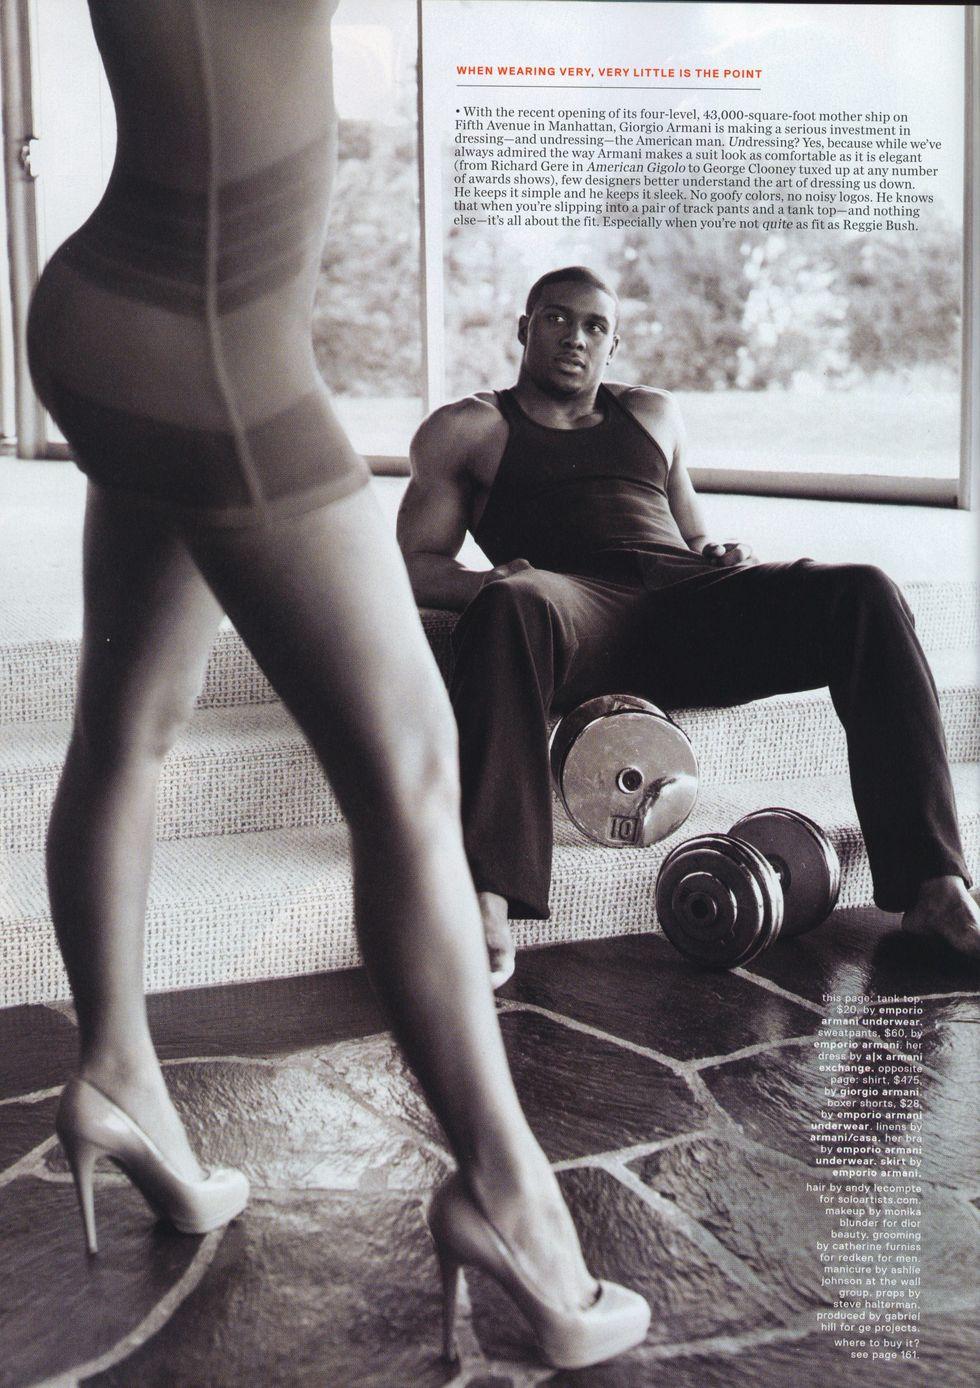 kim-kardashian-gq-magazine-april-2009-01